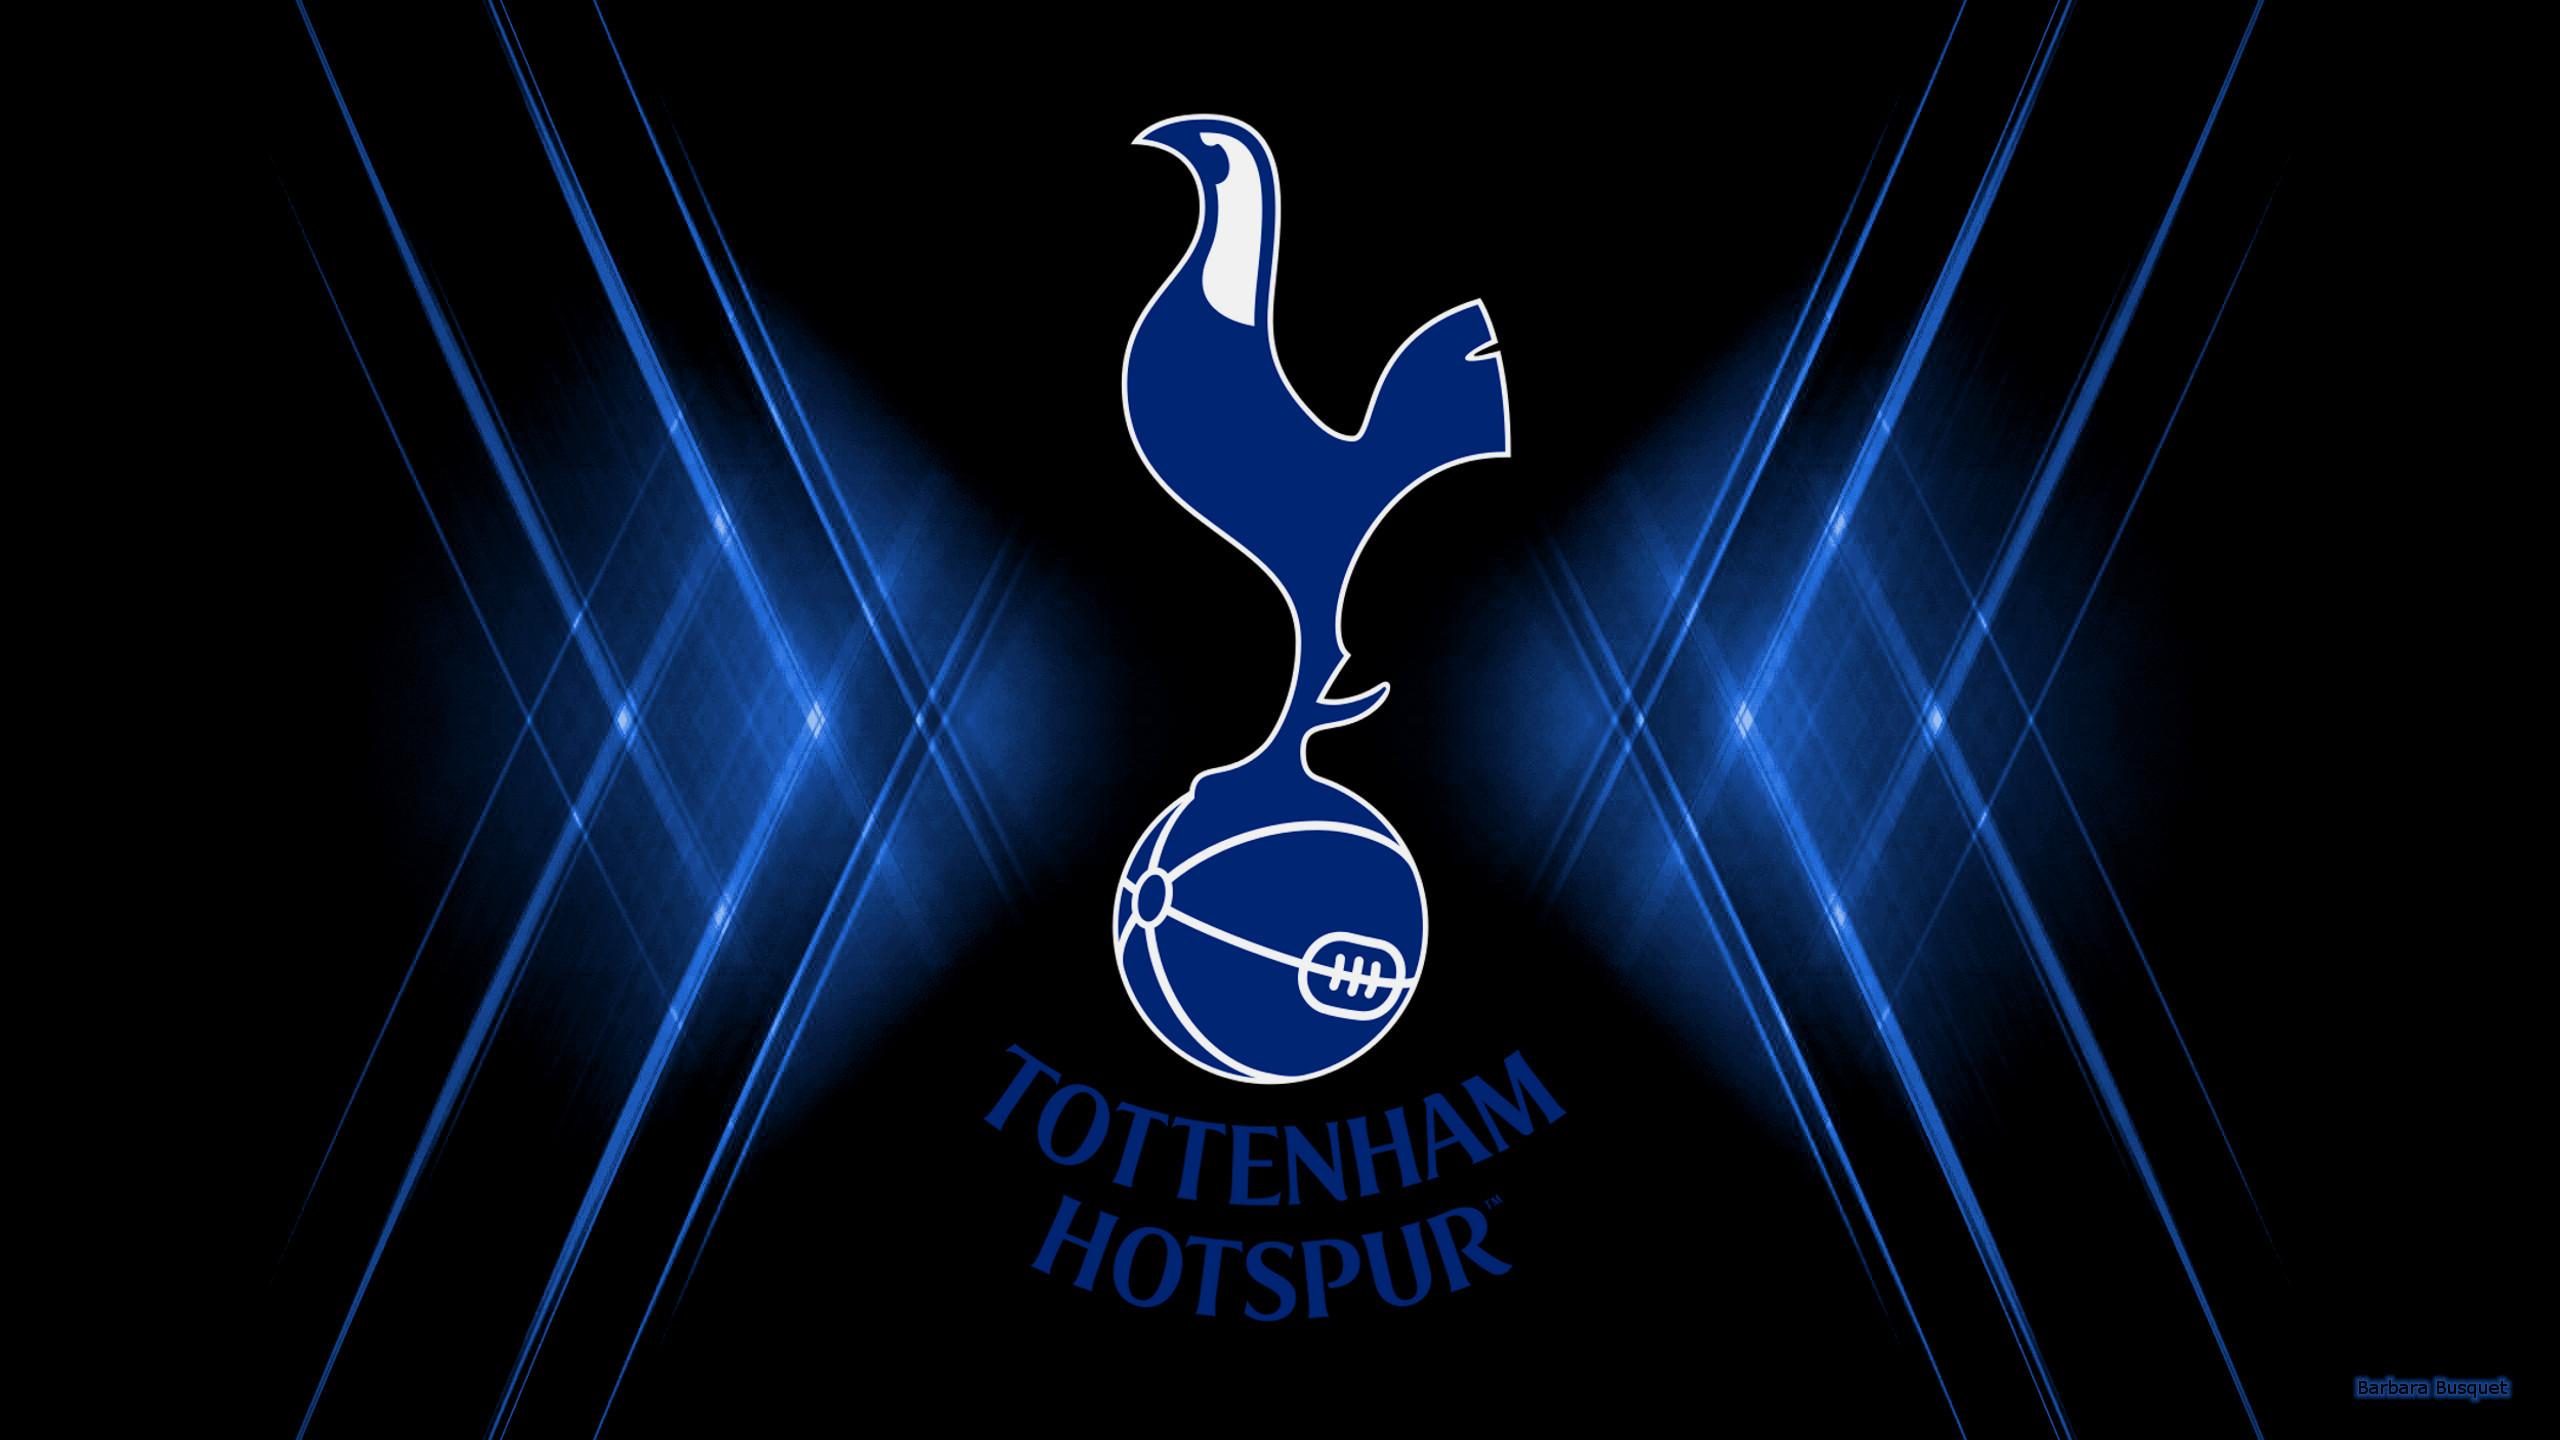 66 Tottenham Hotspur Wallpapers on WallpaperPlay 2560x1440